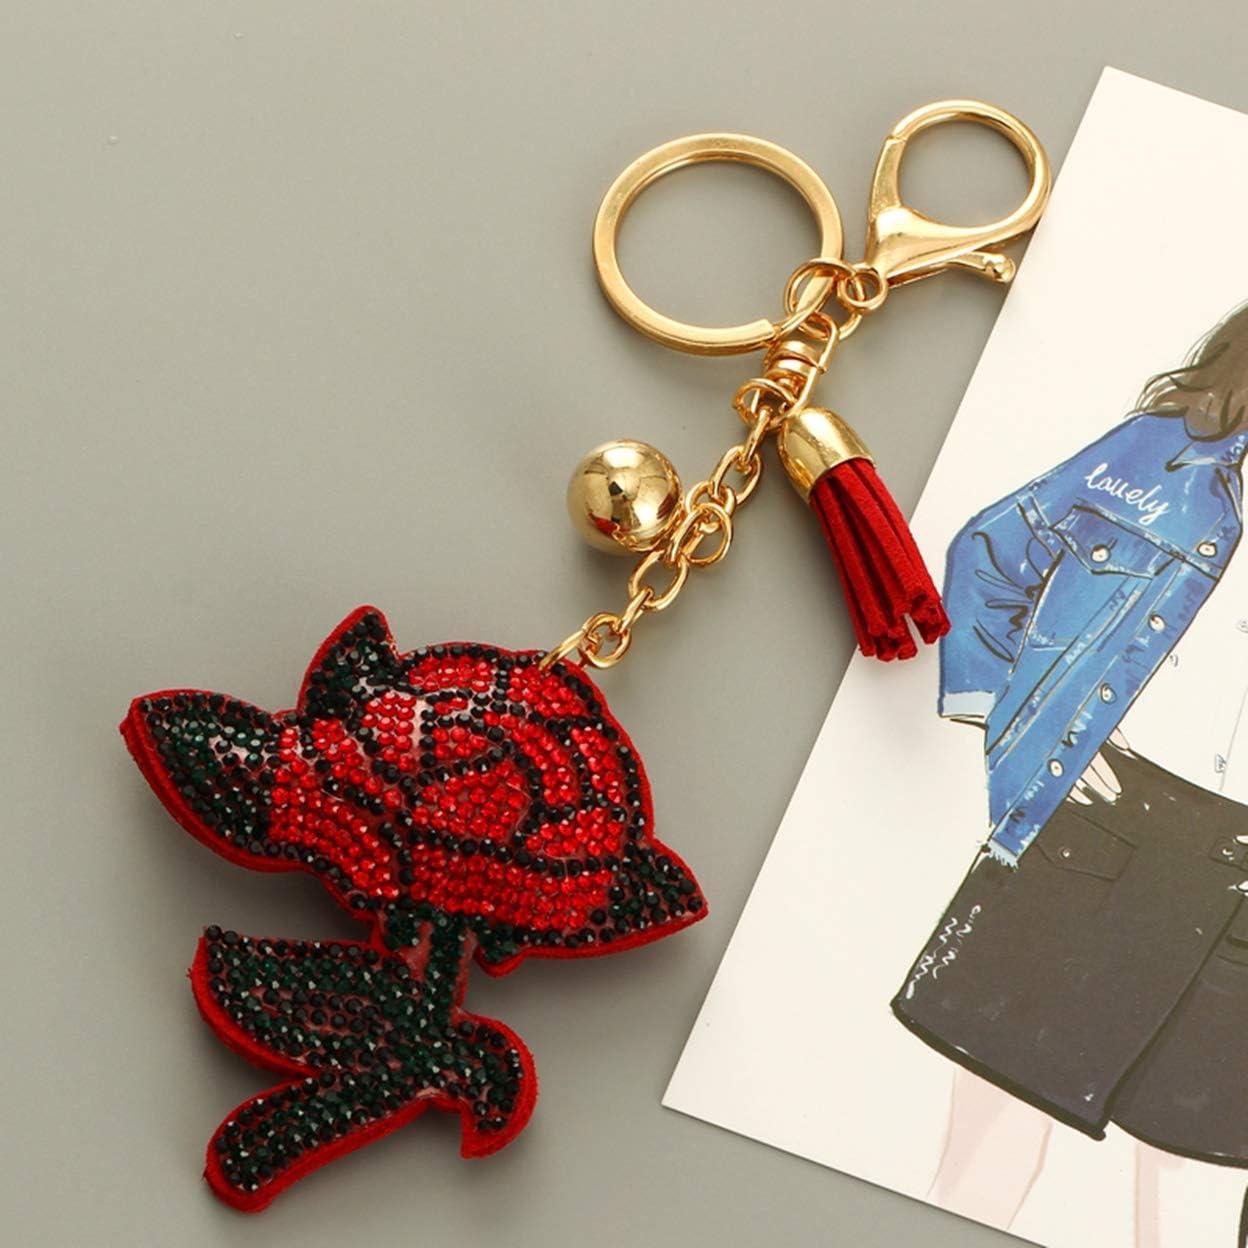 Fashion Butterfly Pendant Leather Rhinestone Key Chain Bag Keychain Women Gift